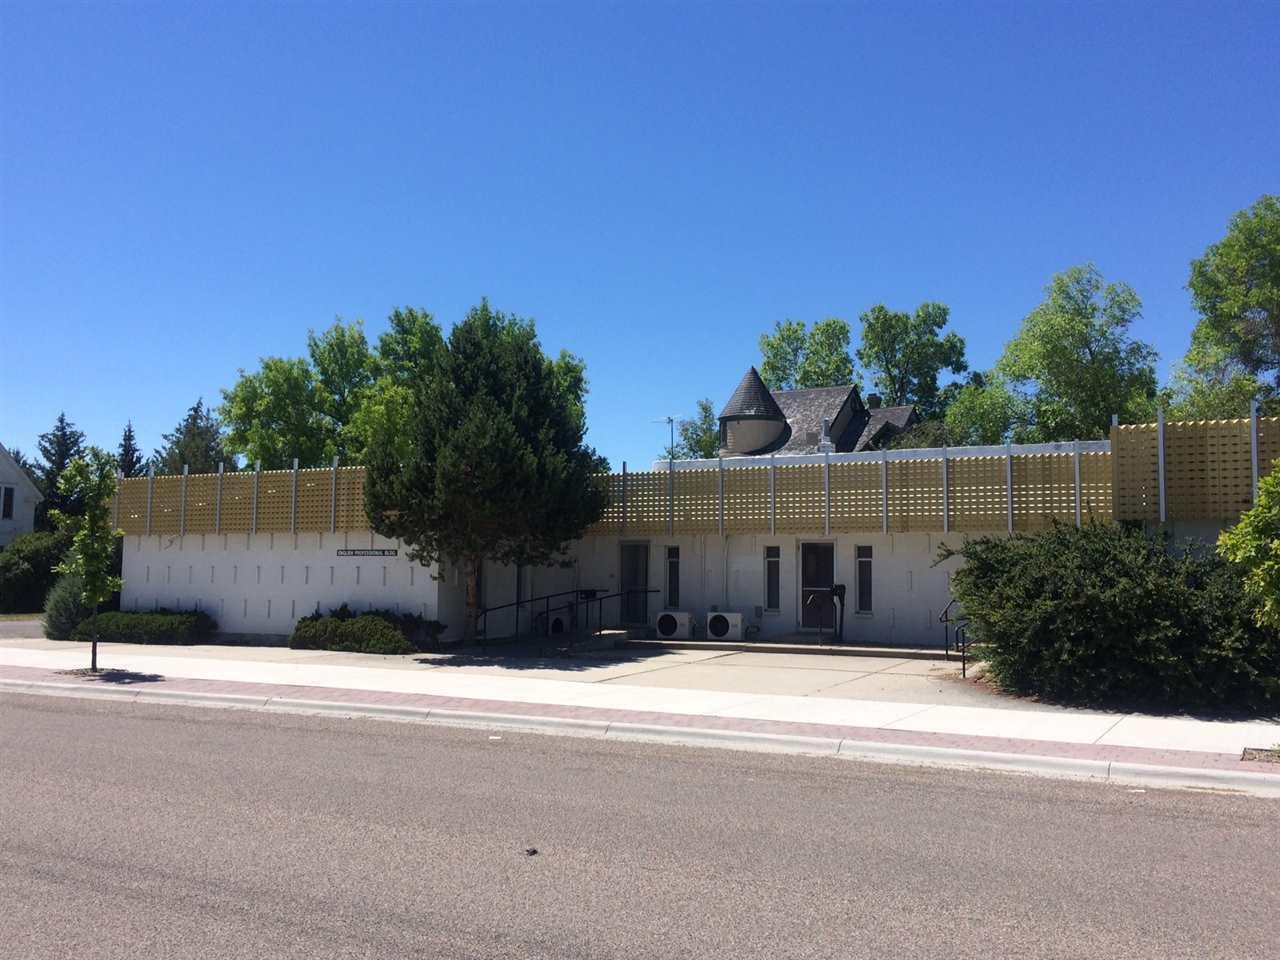 234 E Glendale 234 Glendale, Dillon, MT 59725